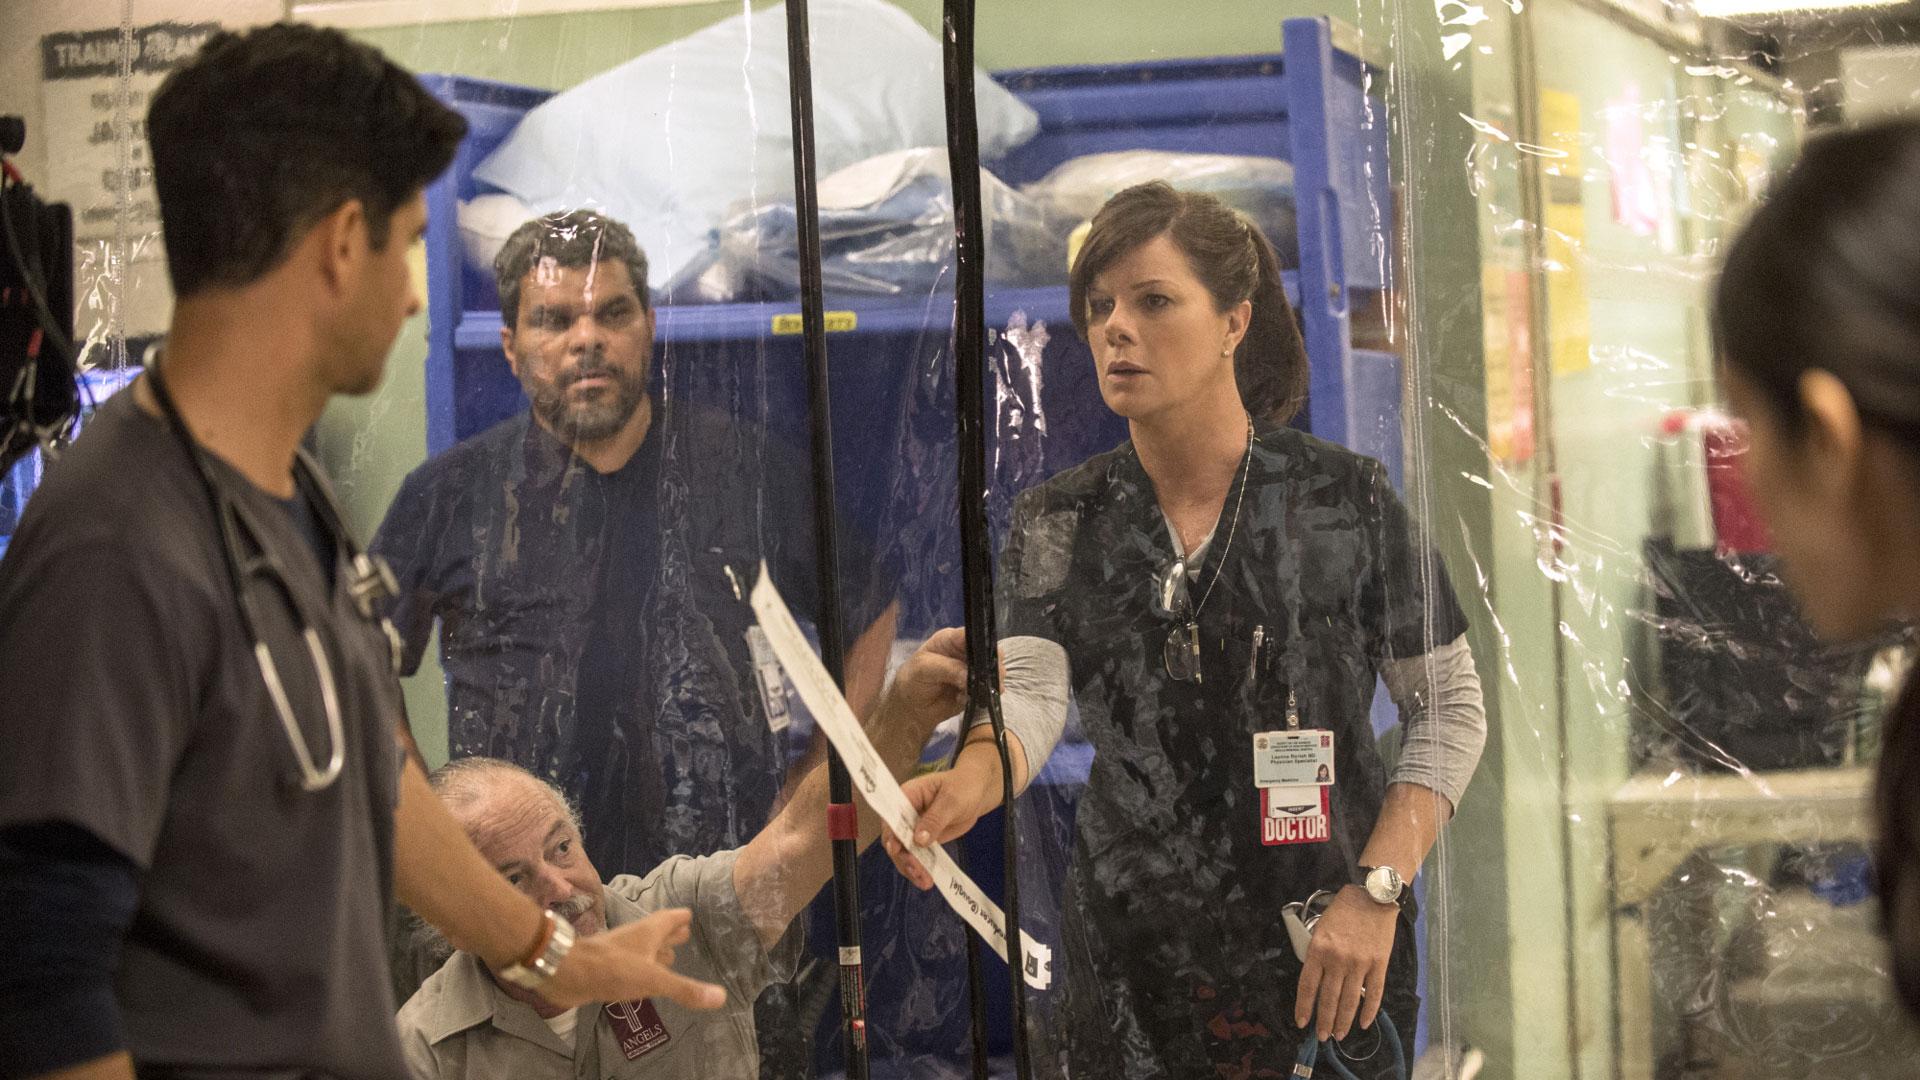 Raza Jaffrey as Dr. Neal Hudson, Luis Guzmán as Jesse Sallander, and Marcia Gay Harden as Dr. Leanne Rorish